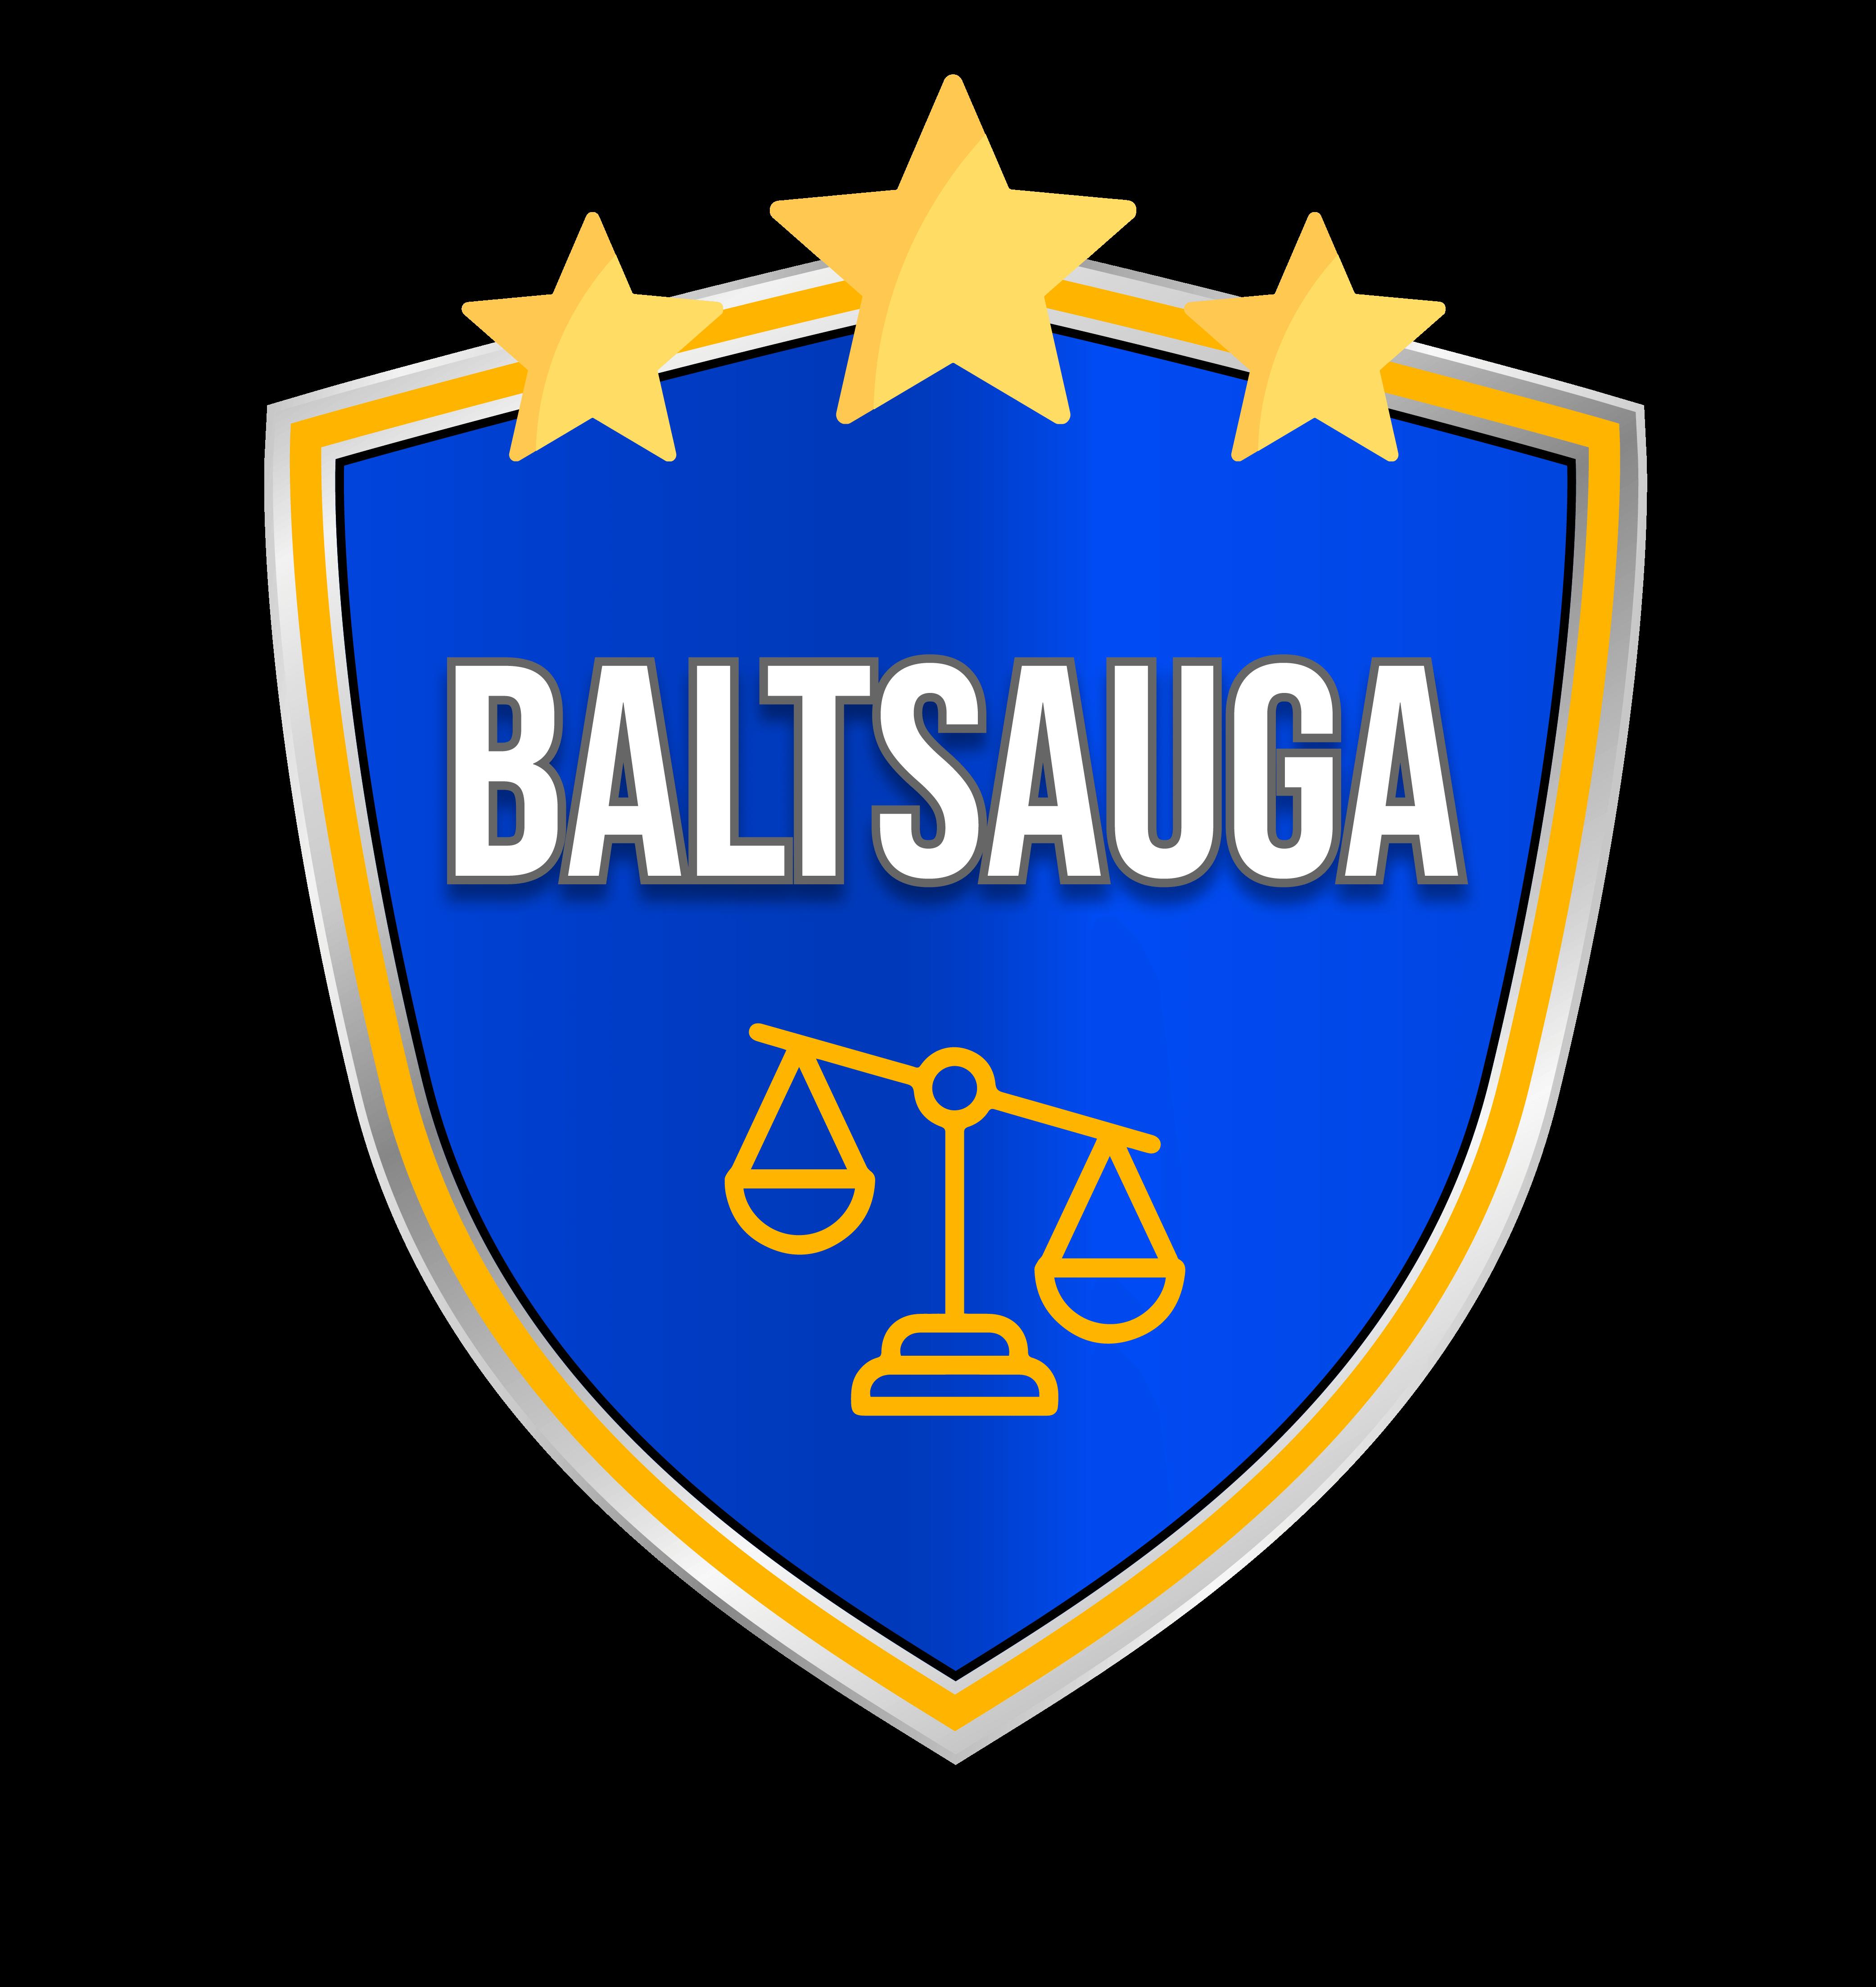 Baltsauga